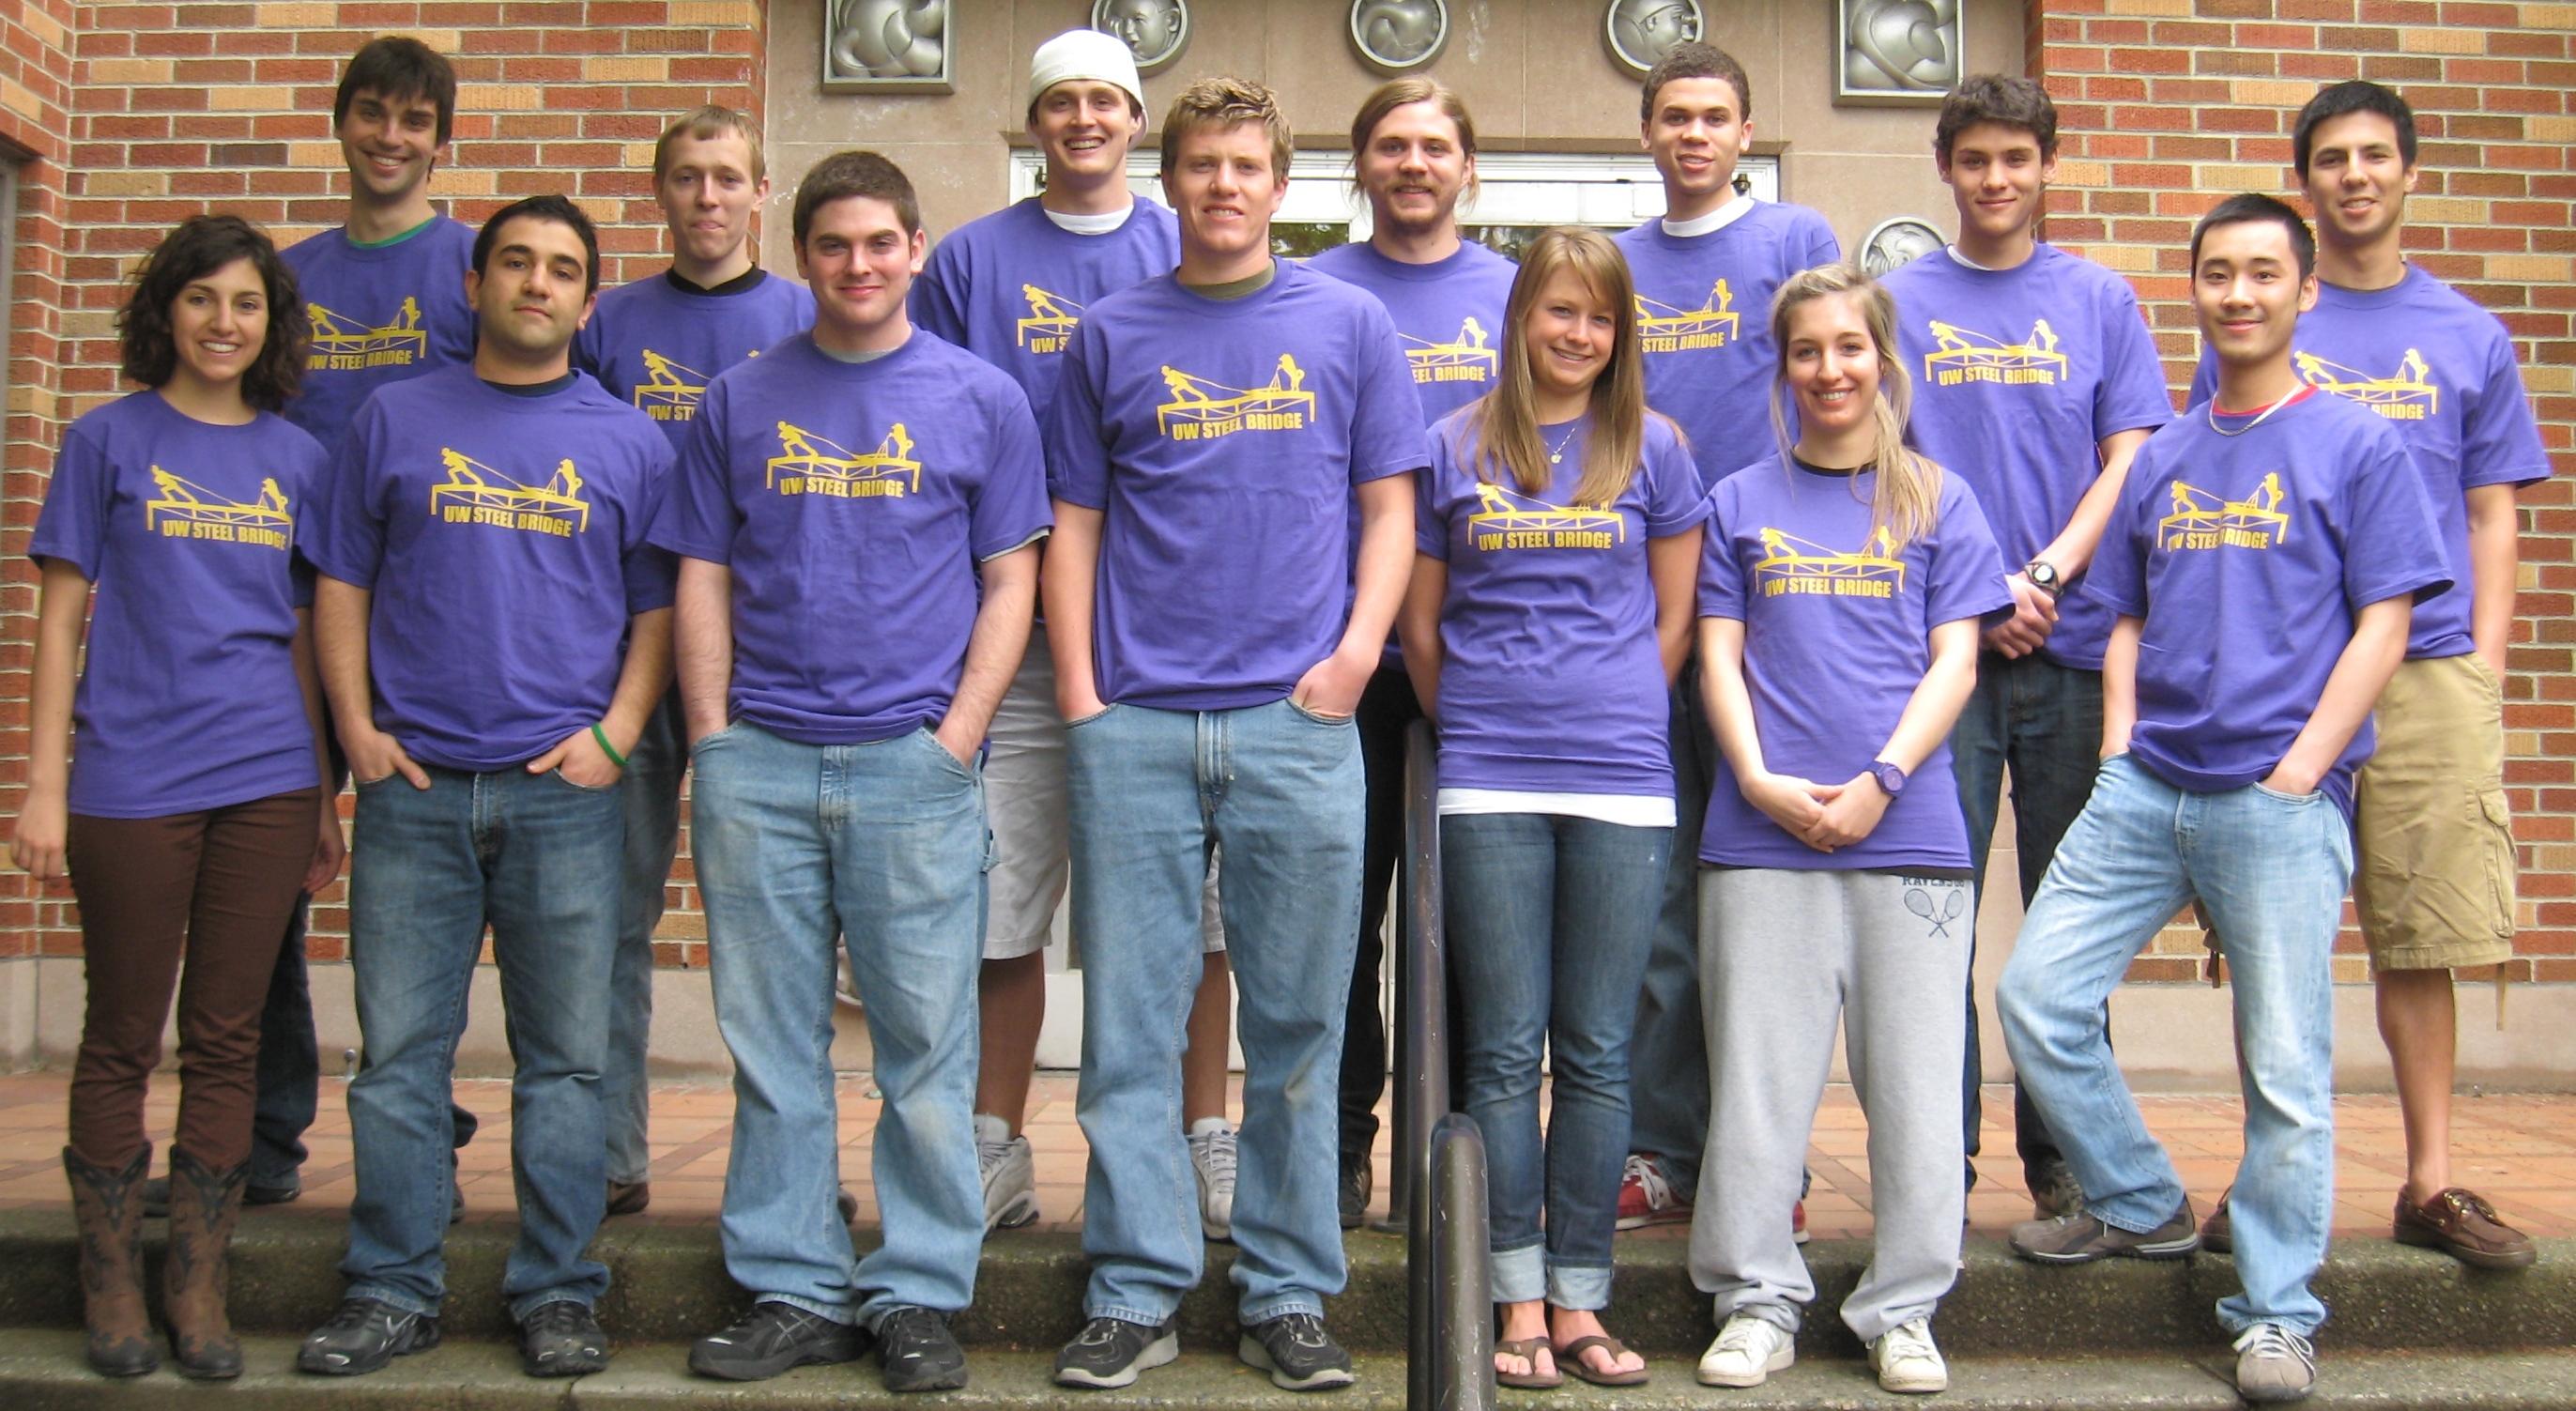 Design t shirt civil engineering - Uw Steel Bridge Team T Shirt Photo